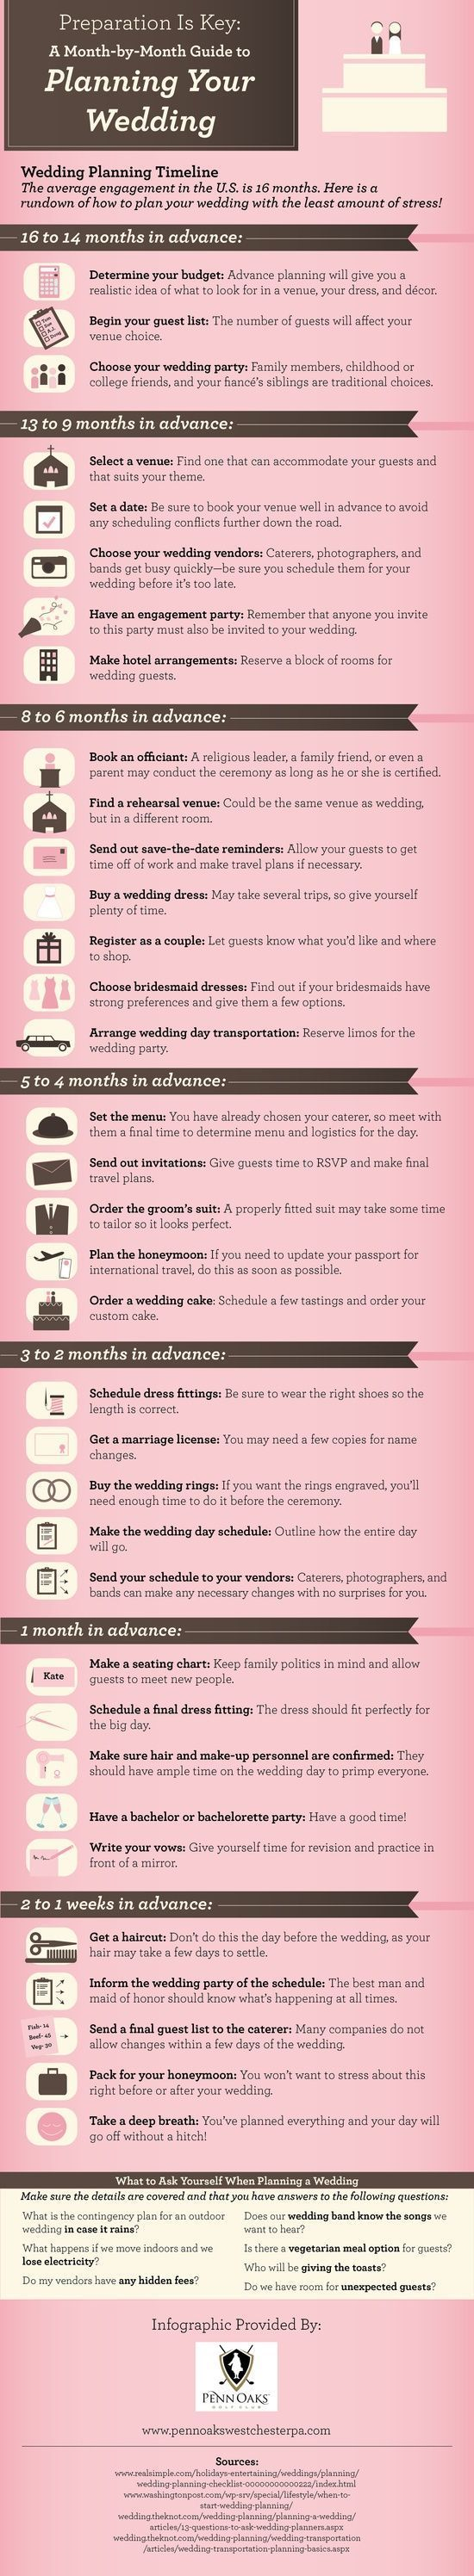 The most comprehensive 12 month wedding planning checklist